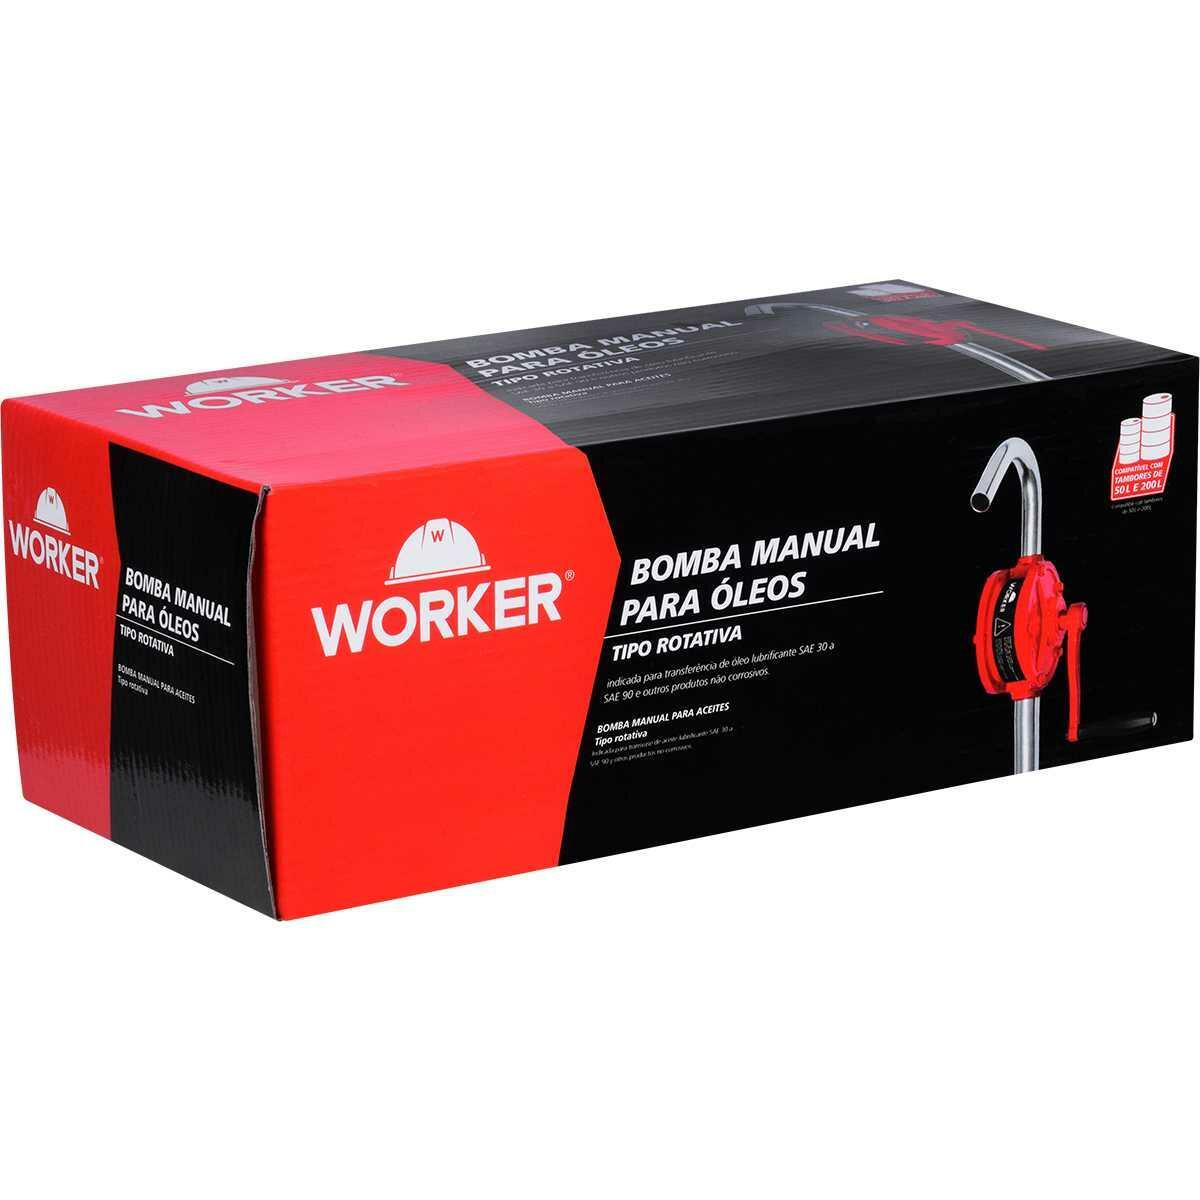 Bomba Manual Rotativa para Transferência de Óleo Worker